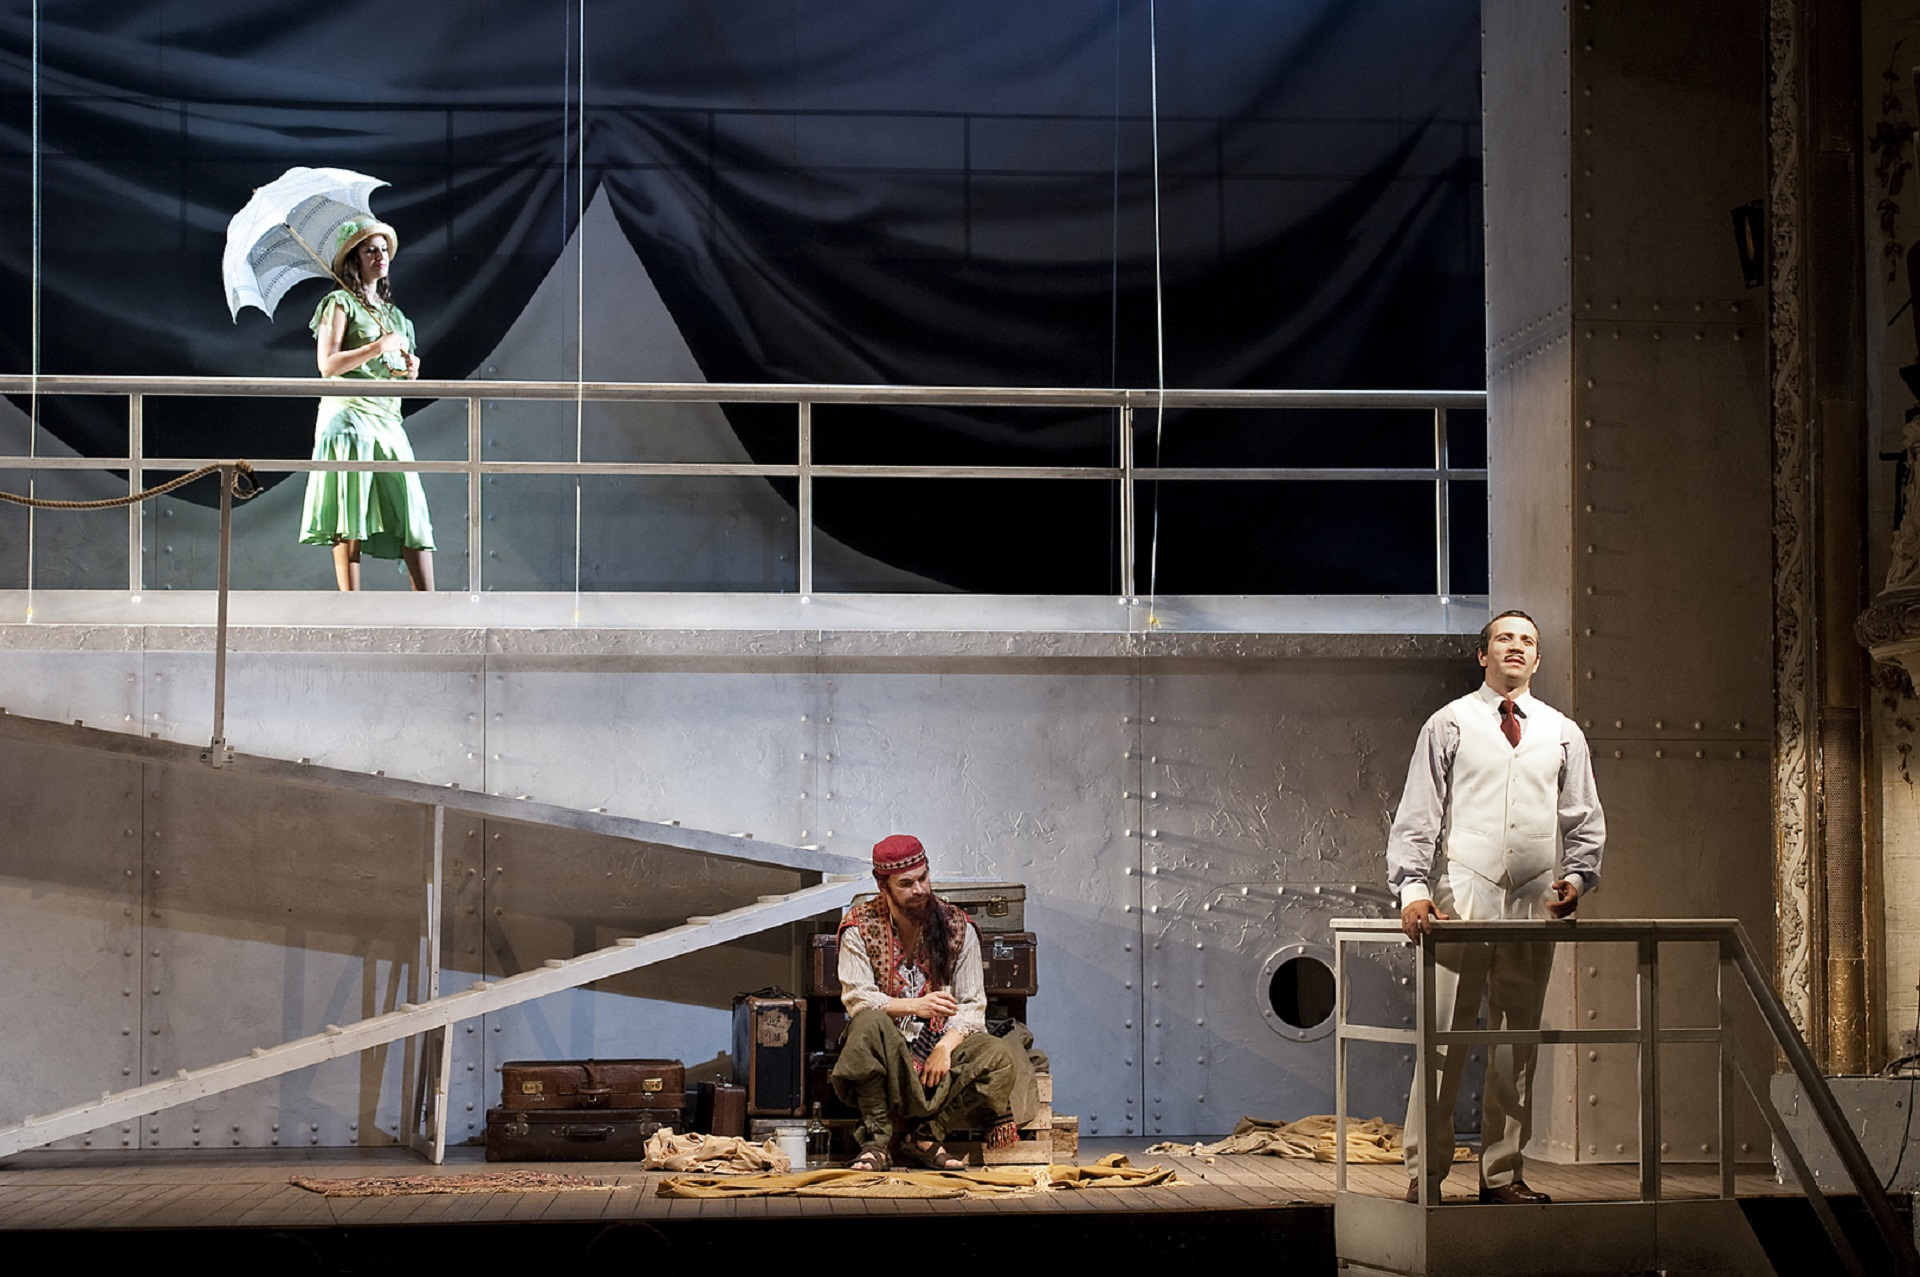 Pilger-Von-Mekka-Opera-Stage-Director-Jacopo-Spirei-3